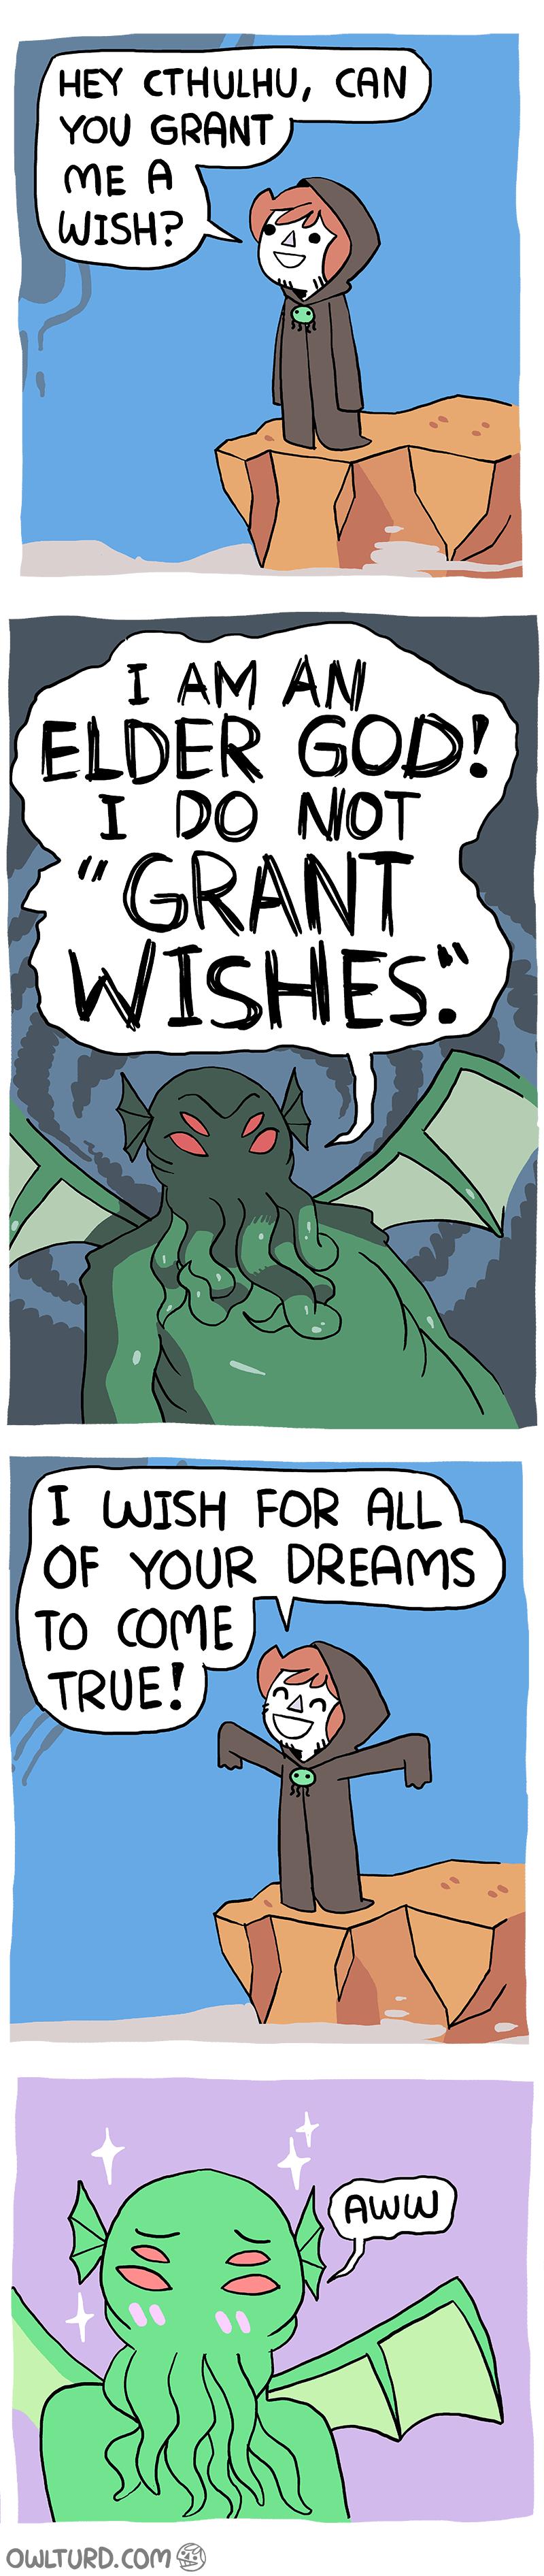 dark-humor-death-wish-web-comics